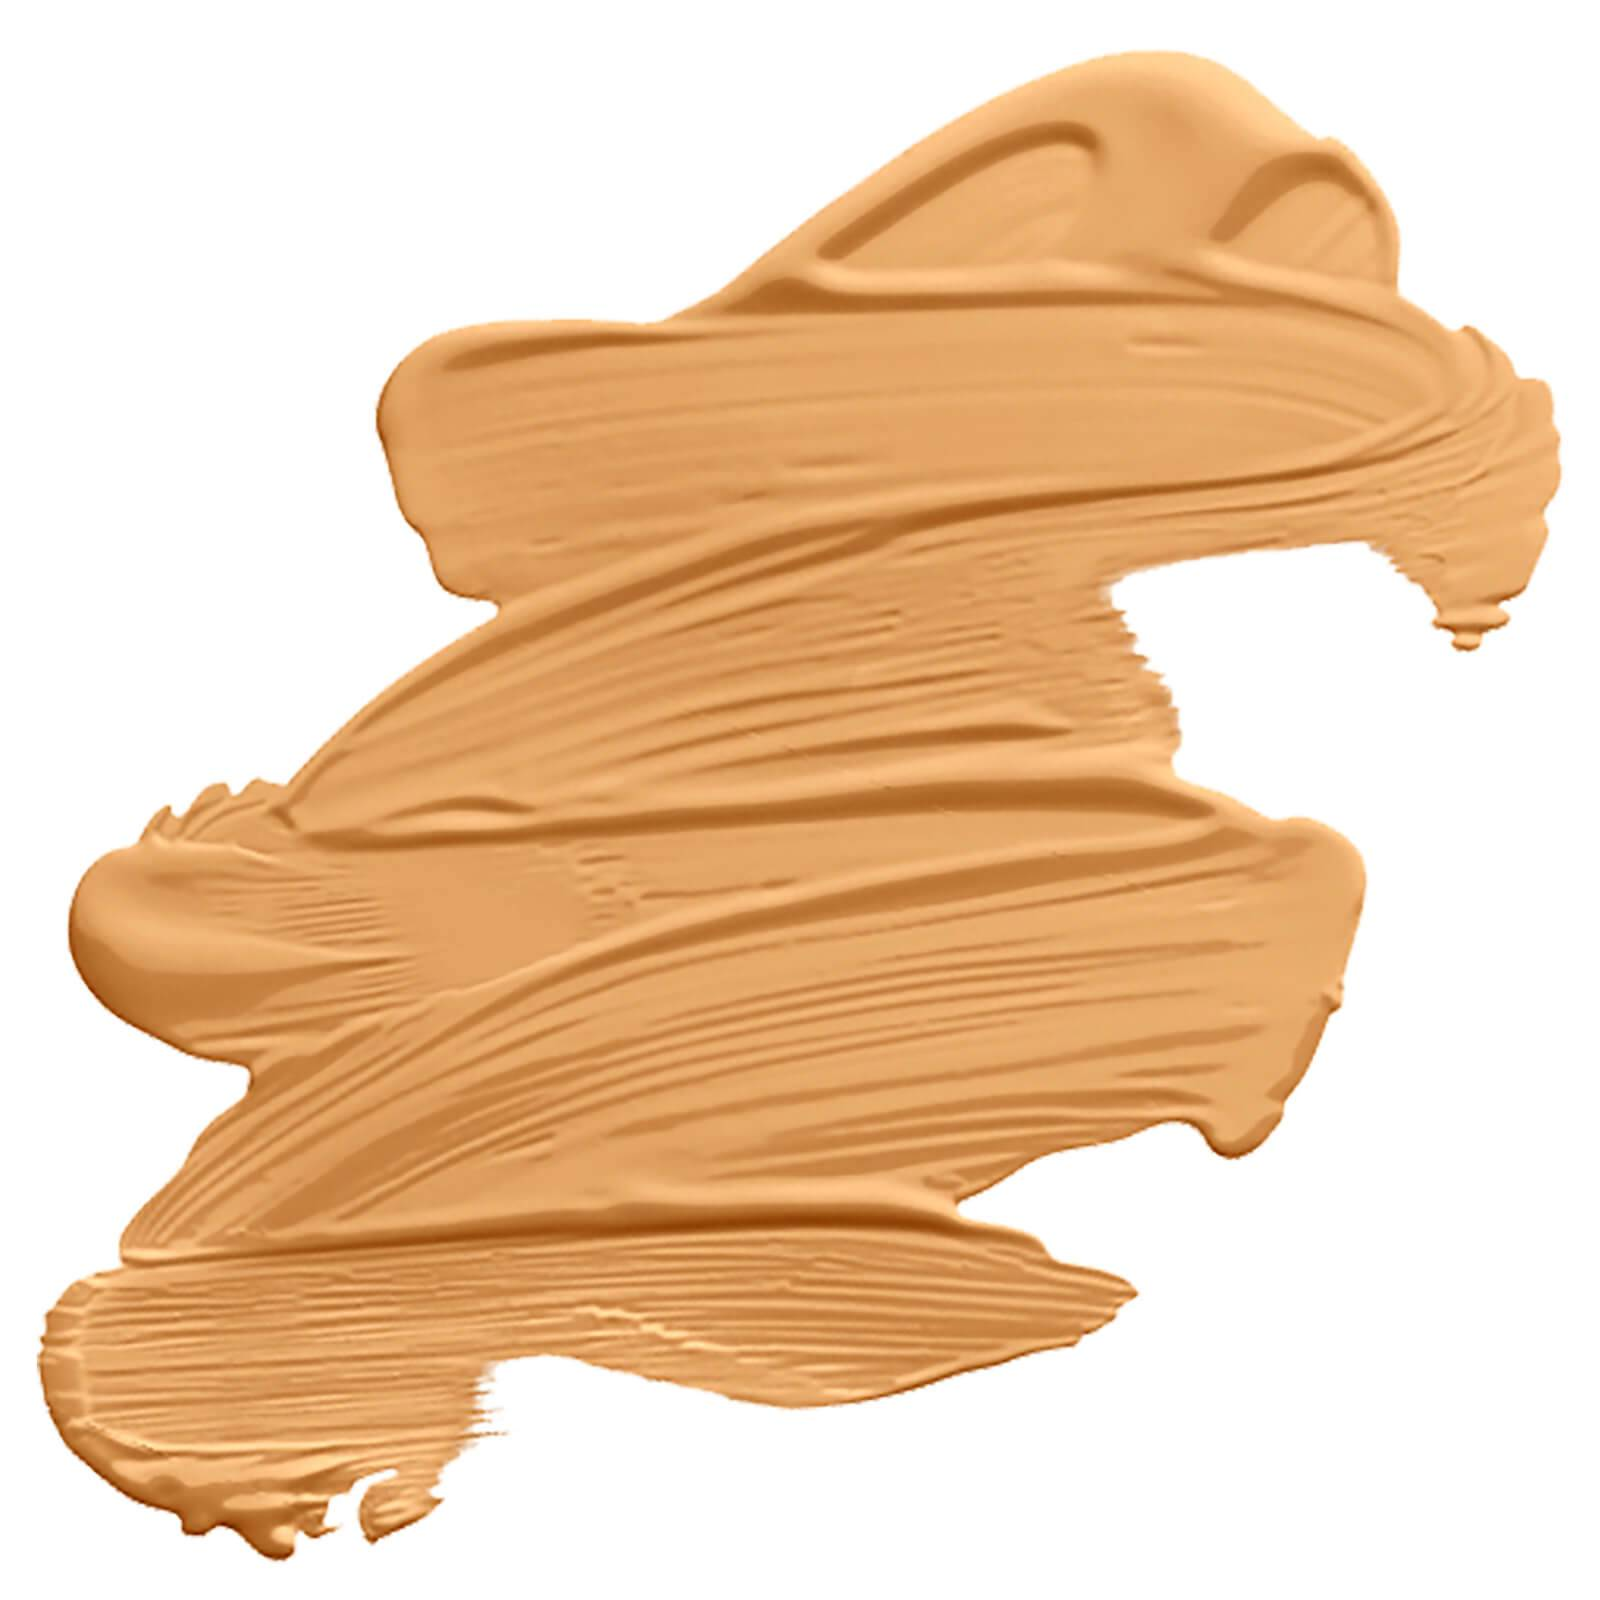 Laura Geller New York Base de maquillaje en crema Cover Lock de Laura Geller 30 ml (varios tonos) - Sand